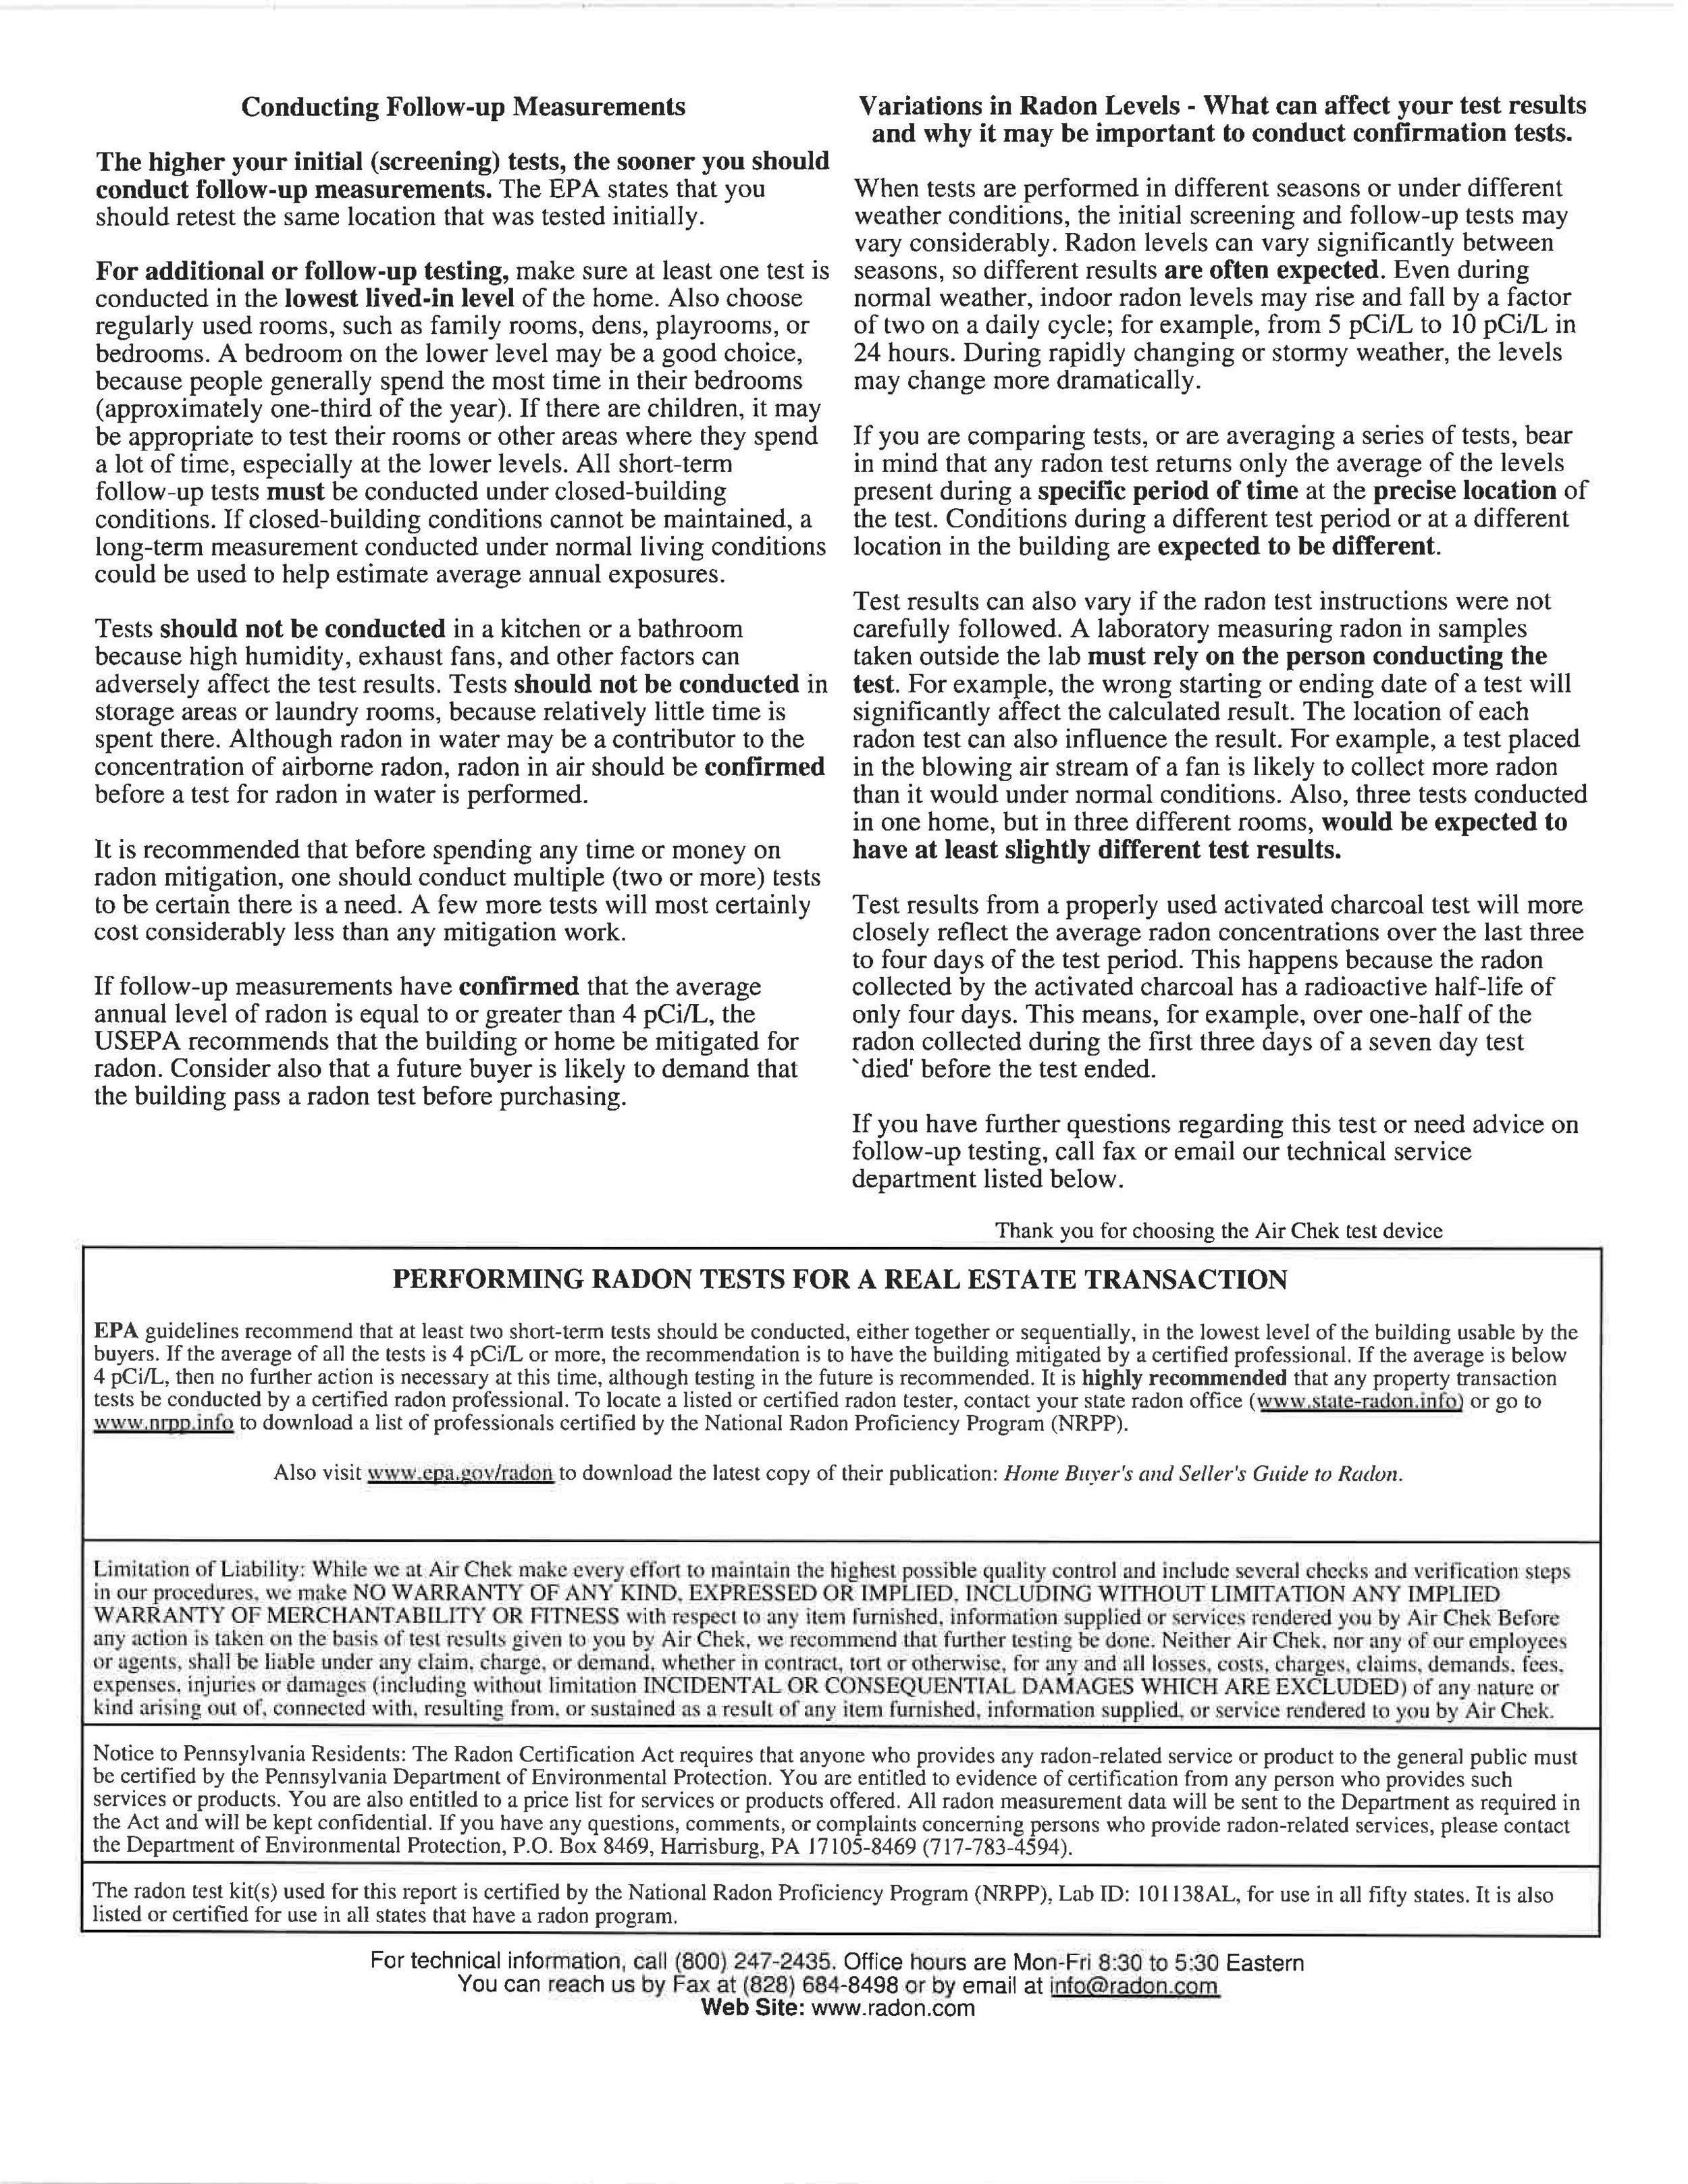 Radon Test - hunter_Page_2.jpg